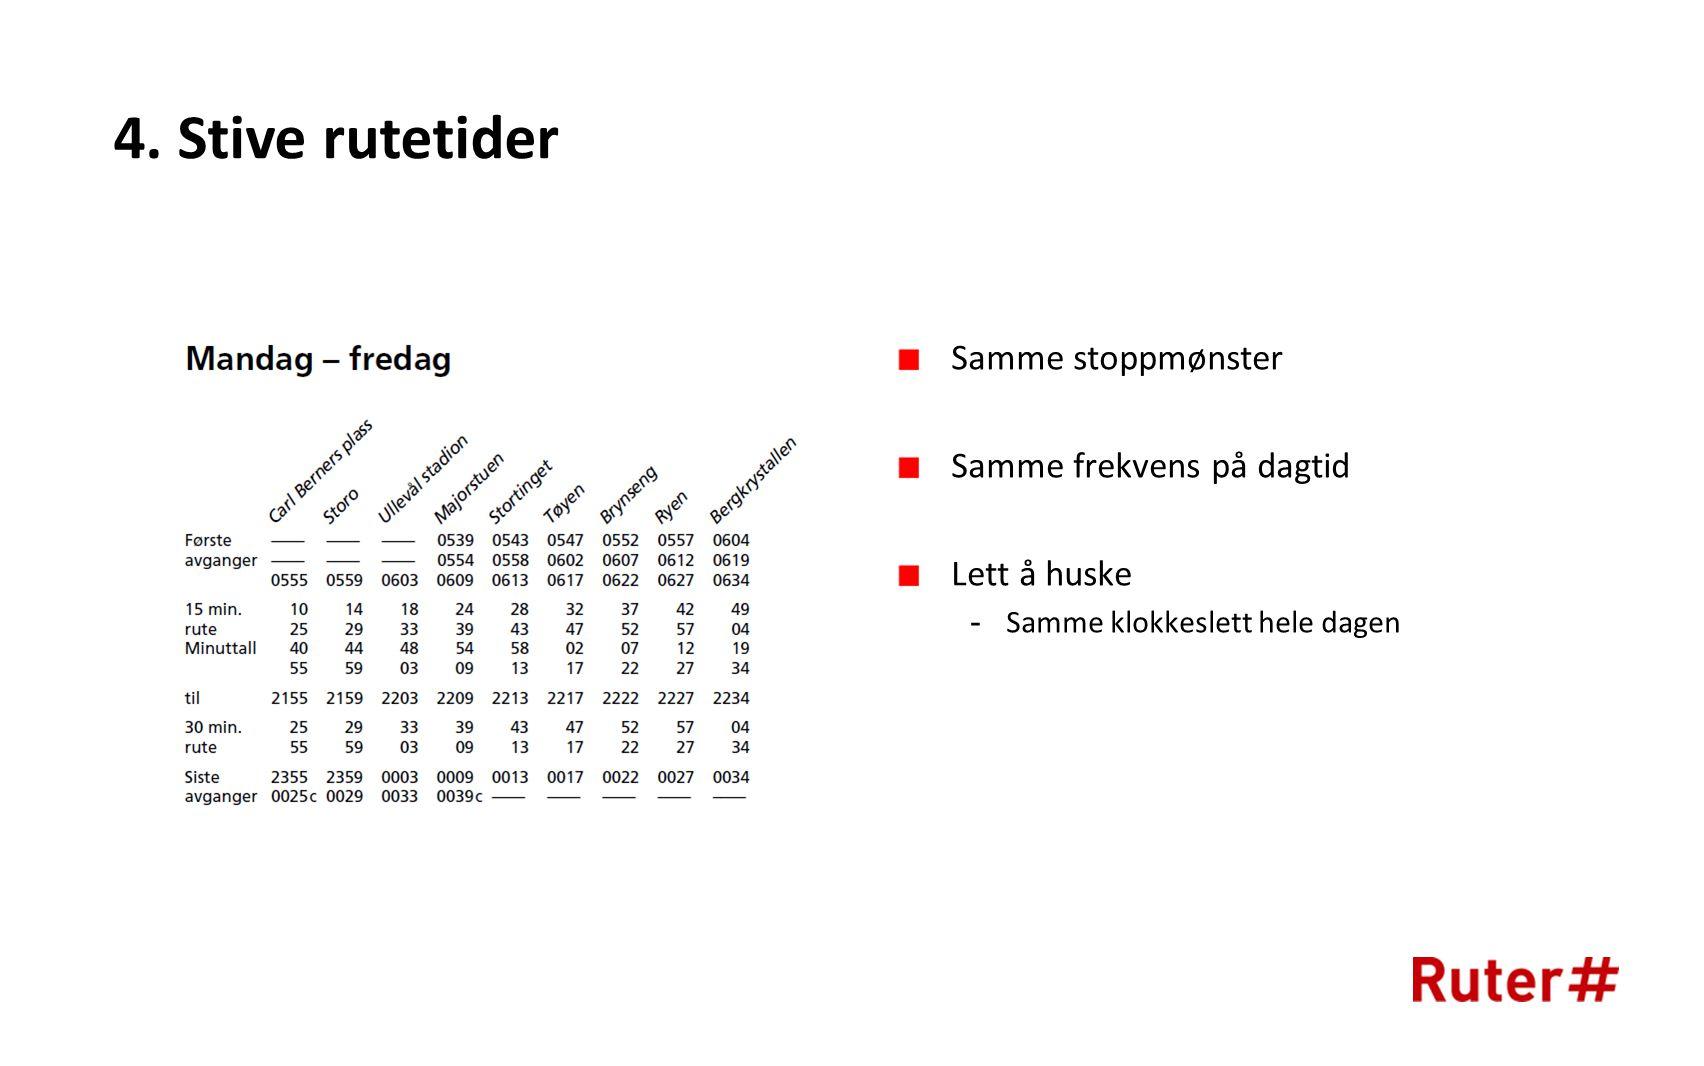 4. Stive rutetider Samme stoppmønster Samme frekvens på dagtid